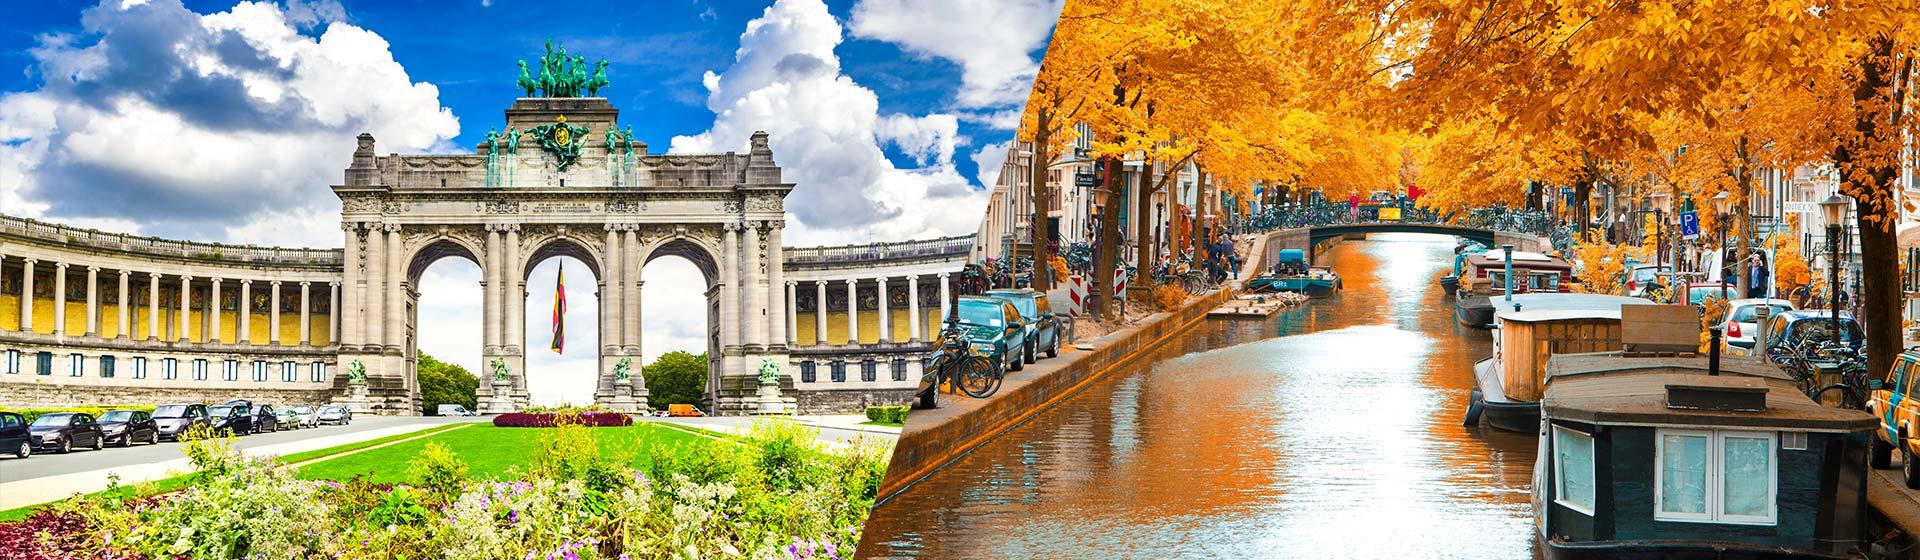 Bruselas-Amsterdam (7 días / 6 noches)